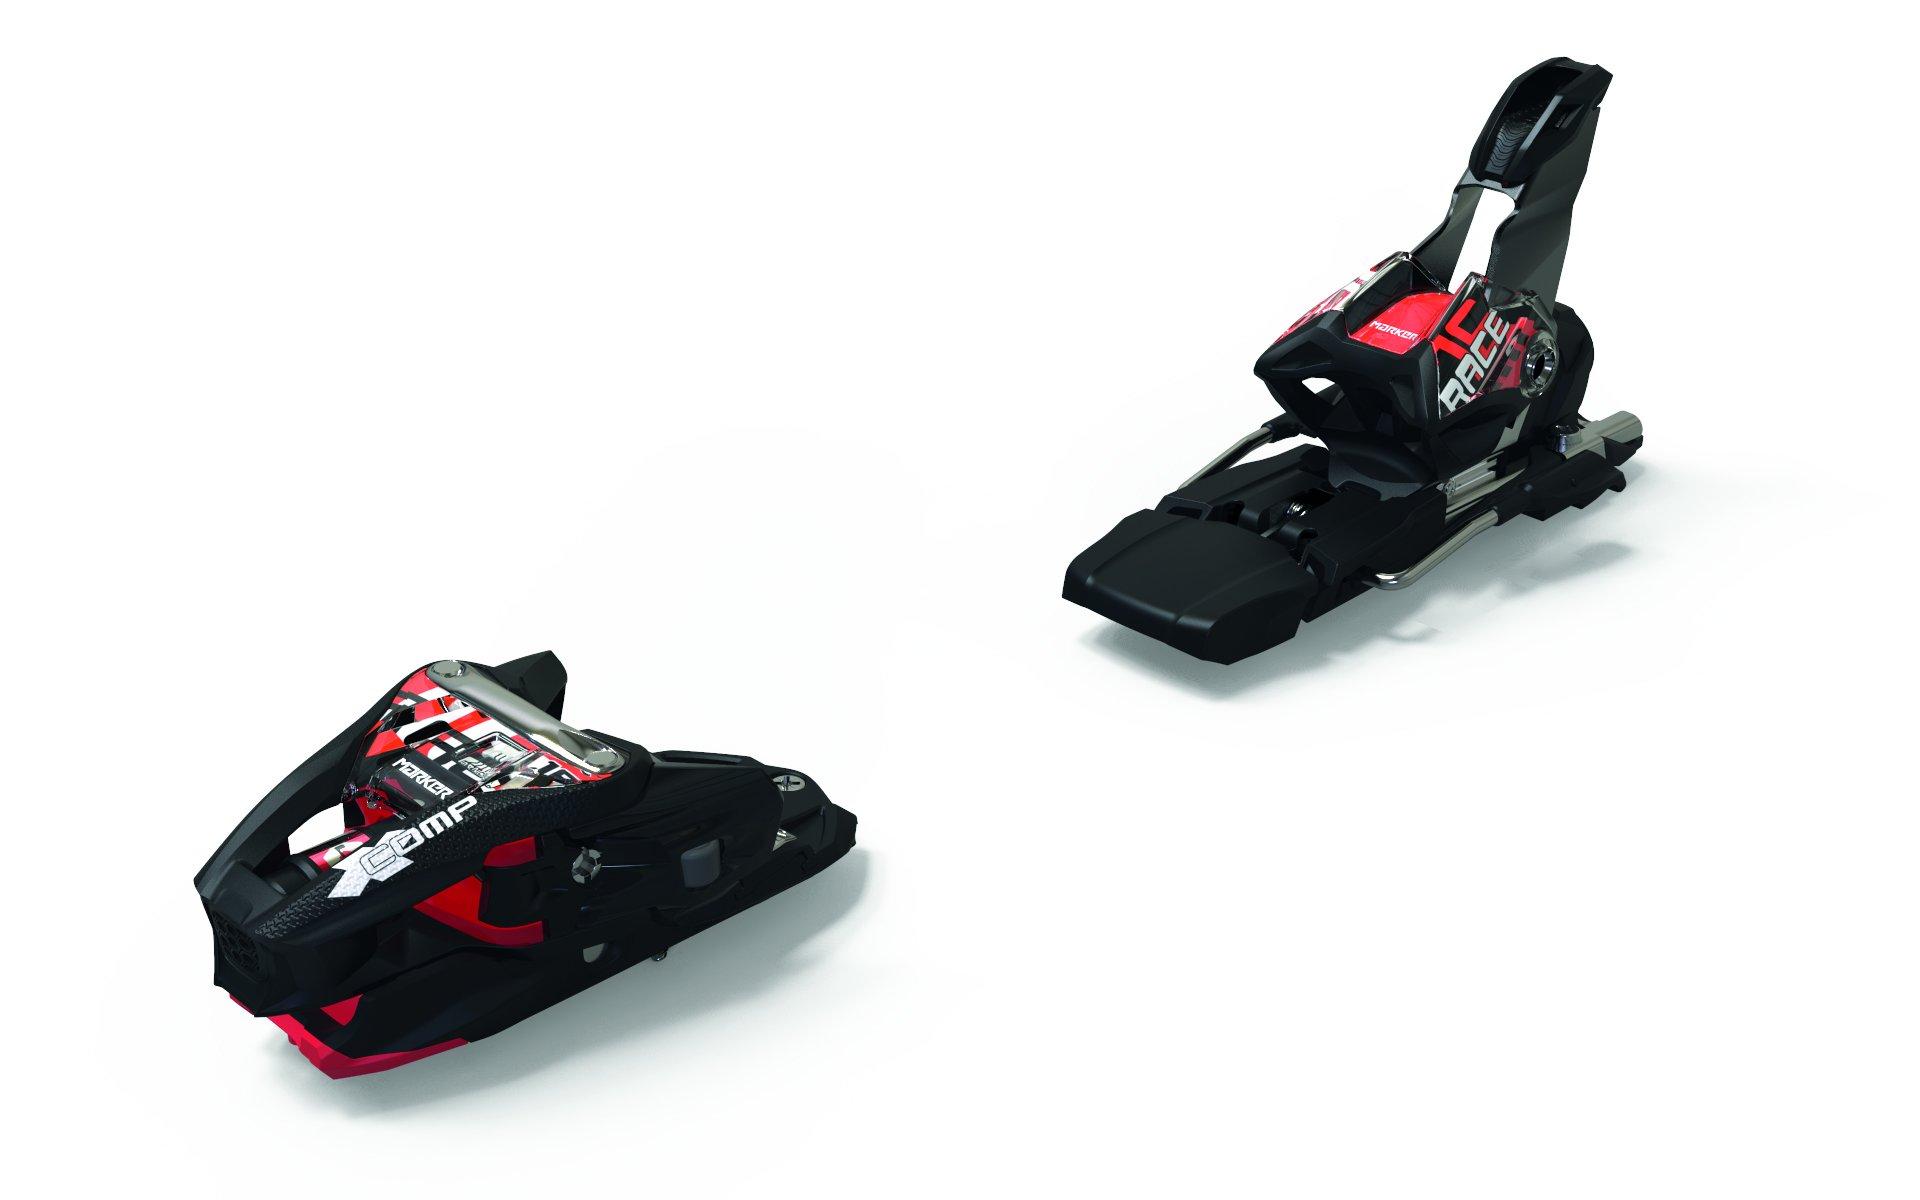 2021 Marker XComp 16 Ski Binding